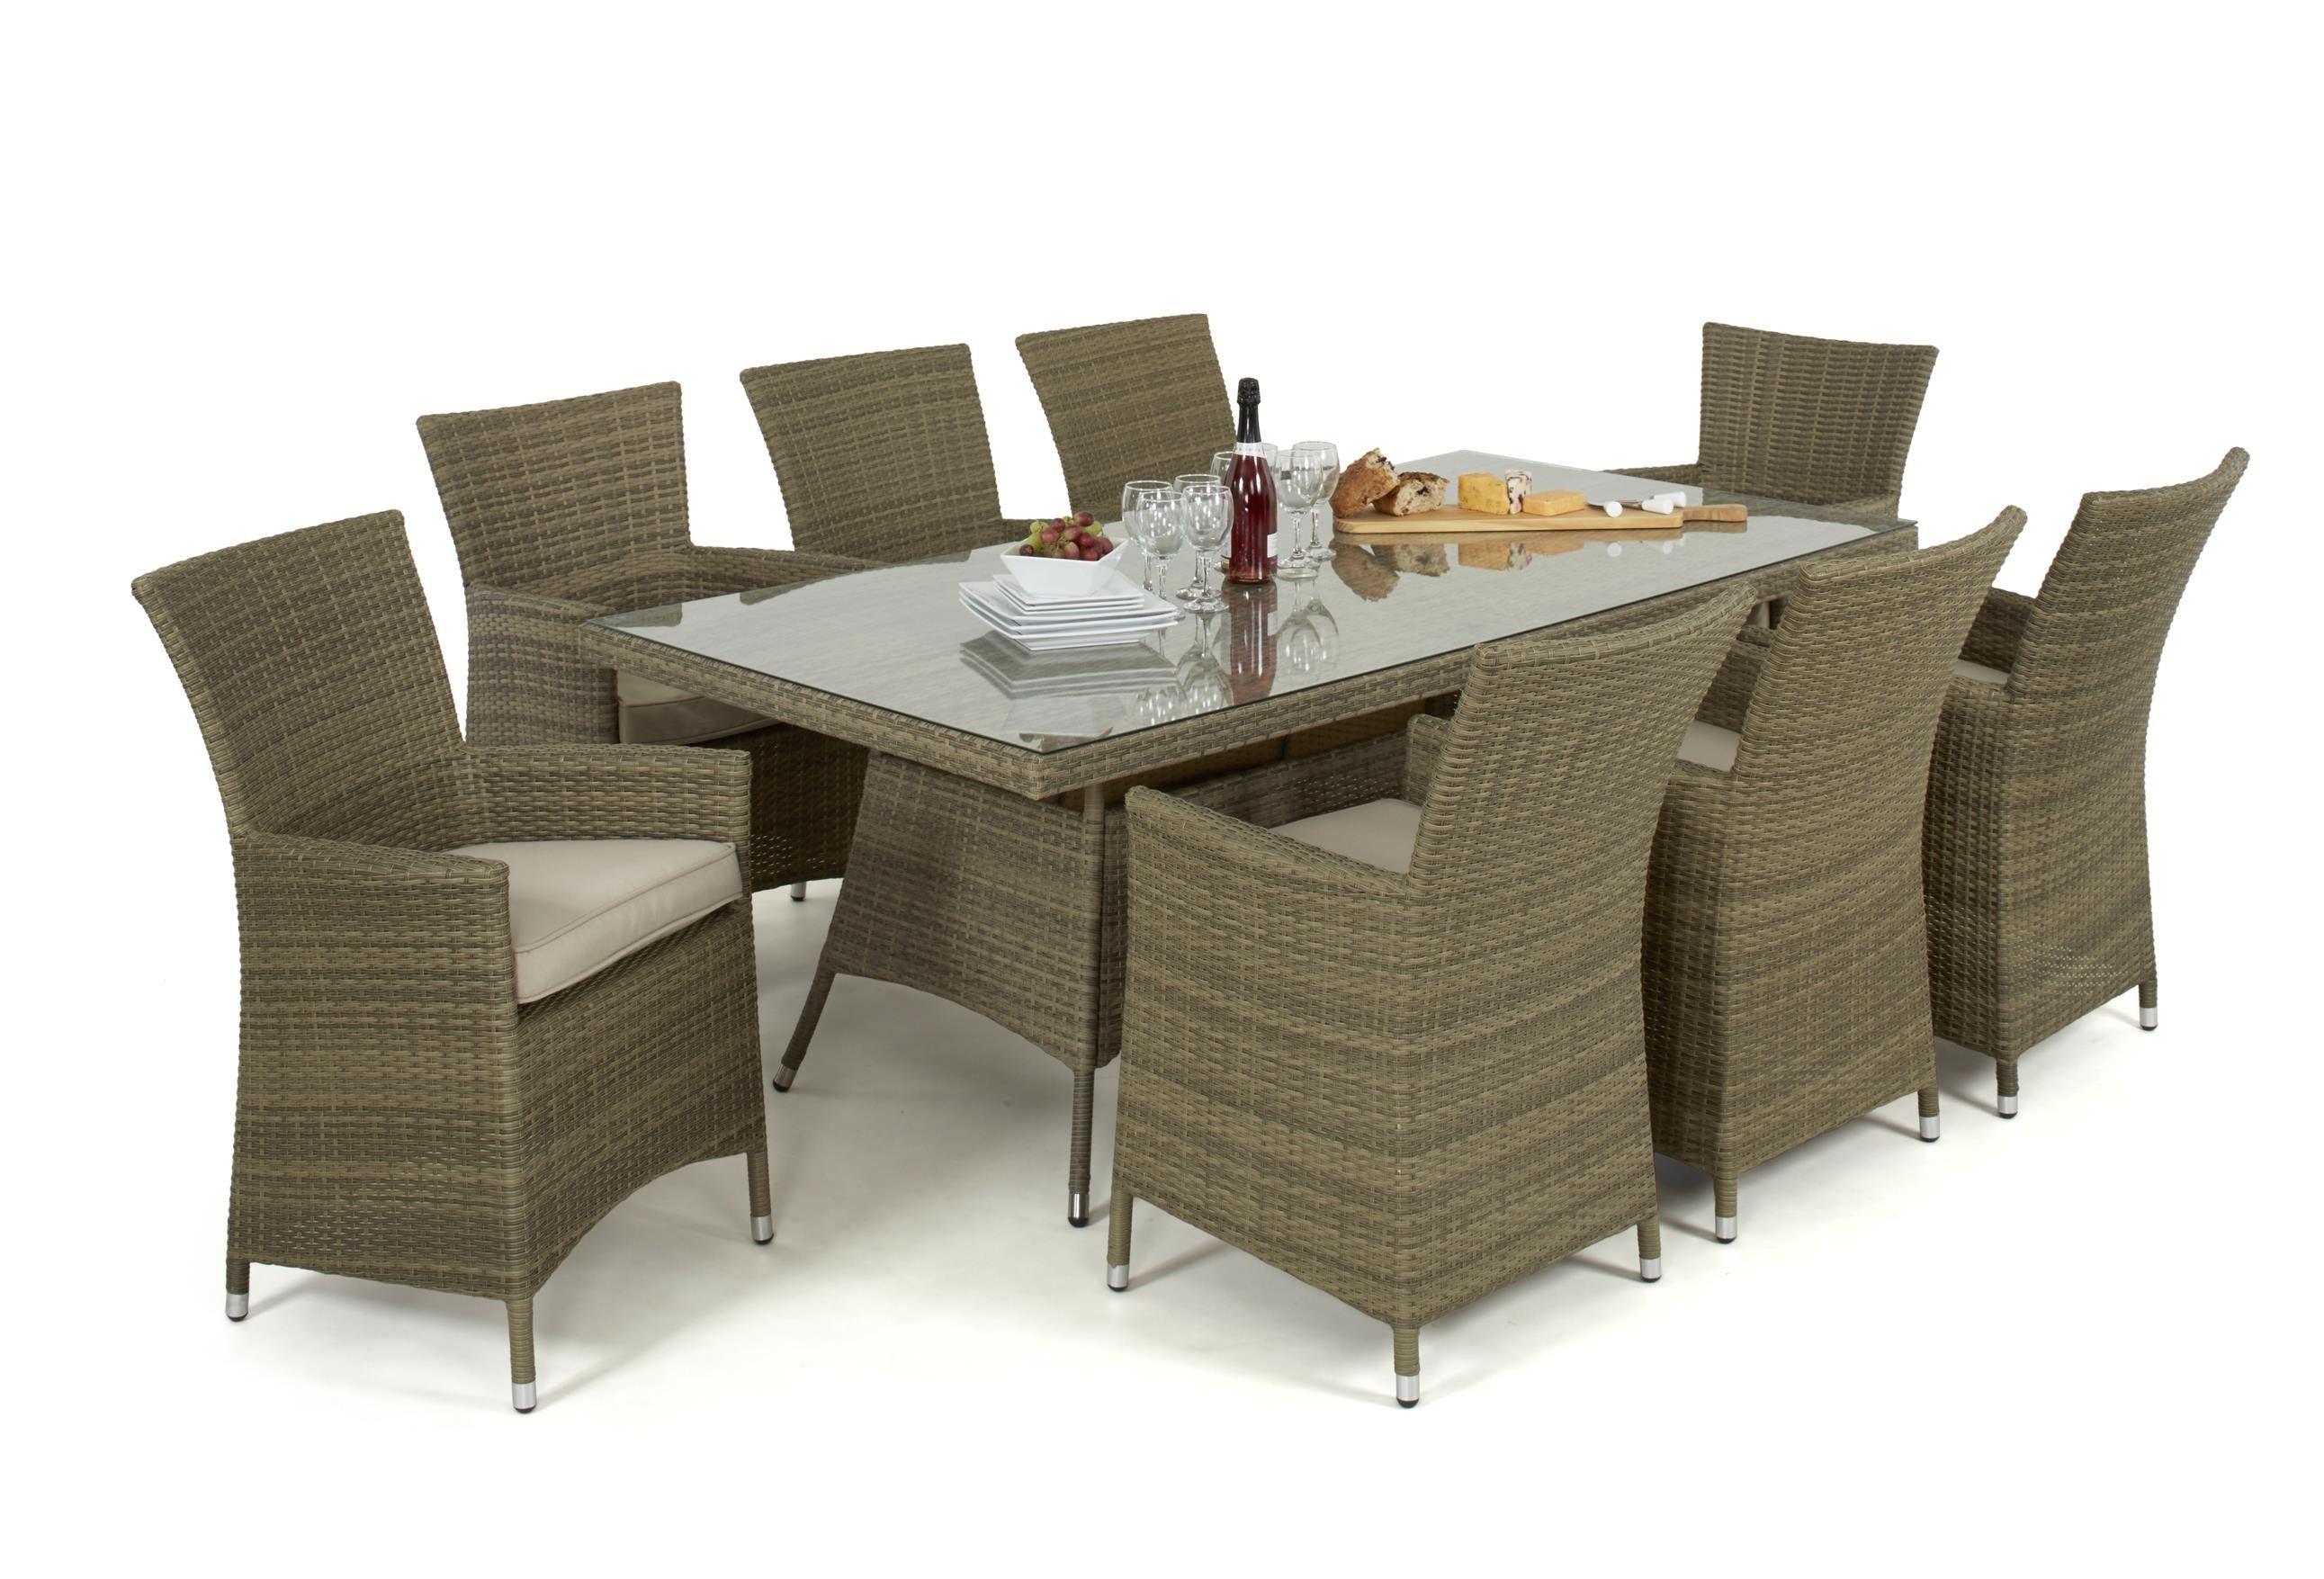 Maze Rattan Tuscany 8 Seat Rectangular 2 Tone Light Weave Garden Furniture Set 200x100cm